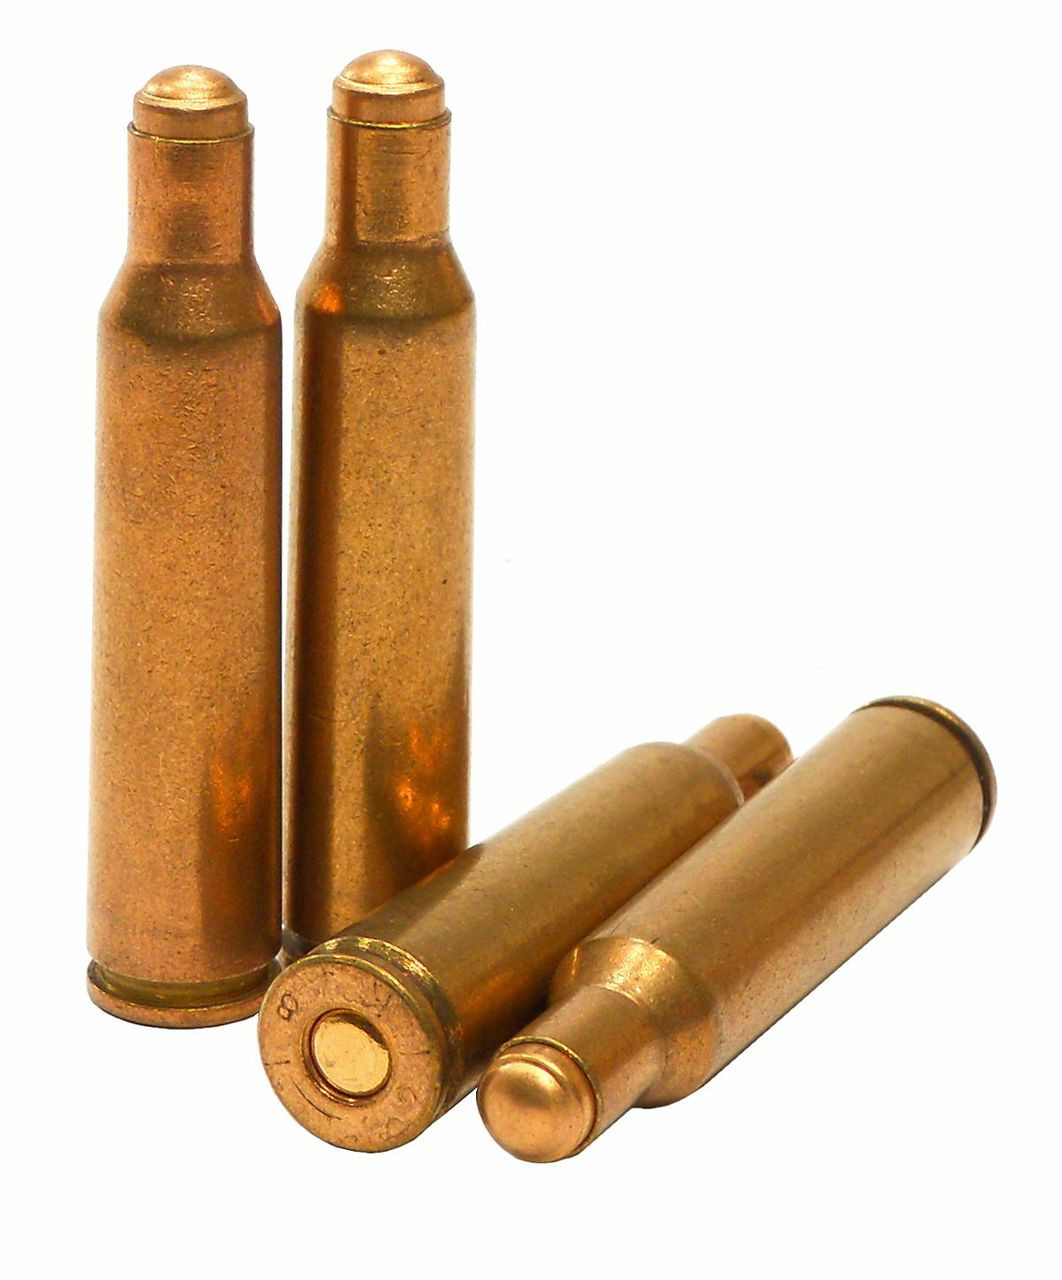 6 5x55 swedish mauser training ammo 10 round pack ammunitionstore com